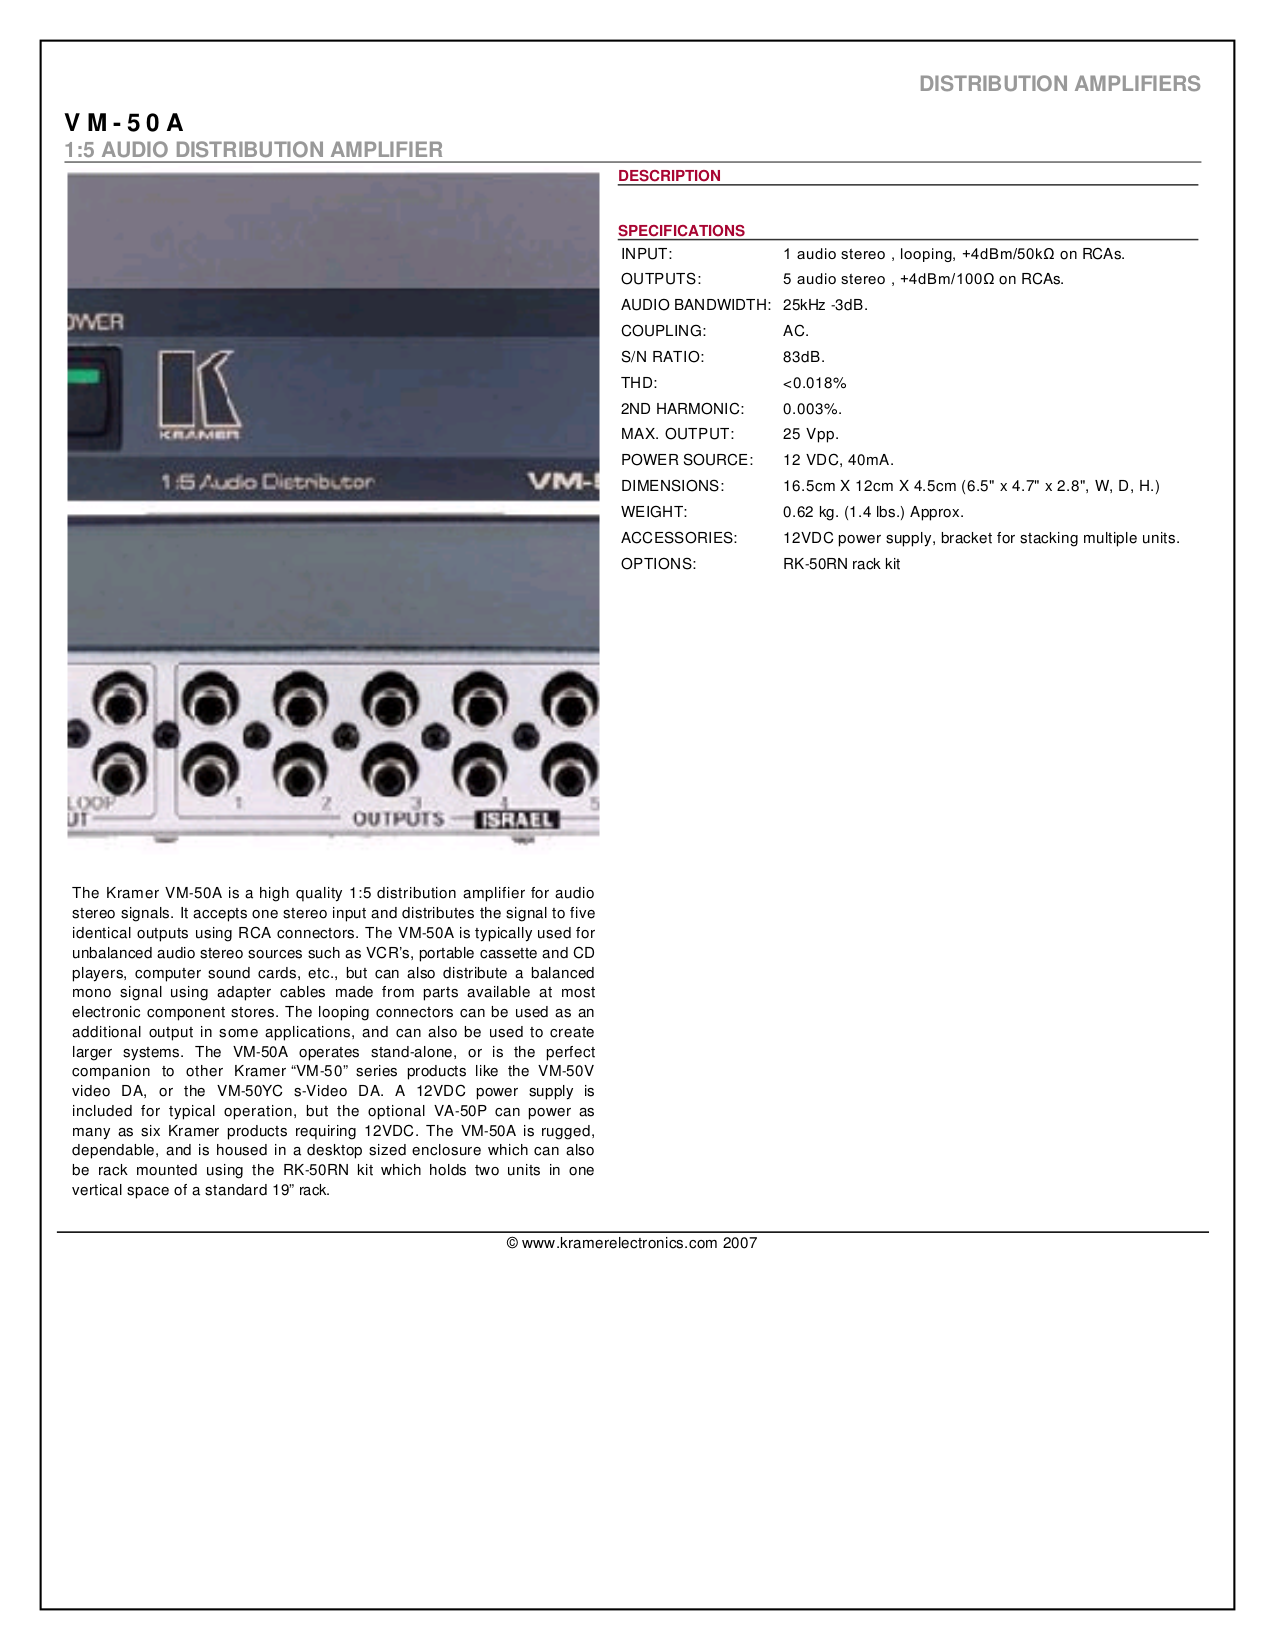 pdf for Kramer Other VM-50A Distribution Amplifiers manual